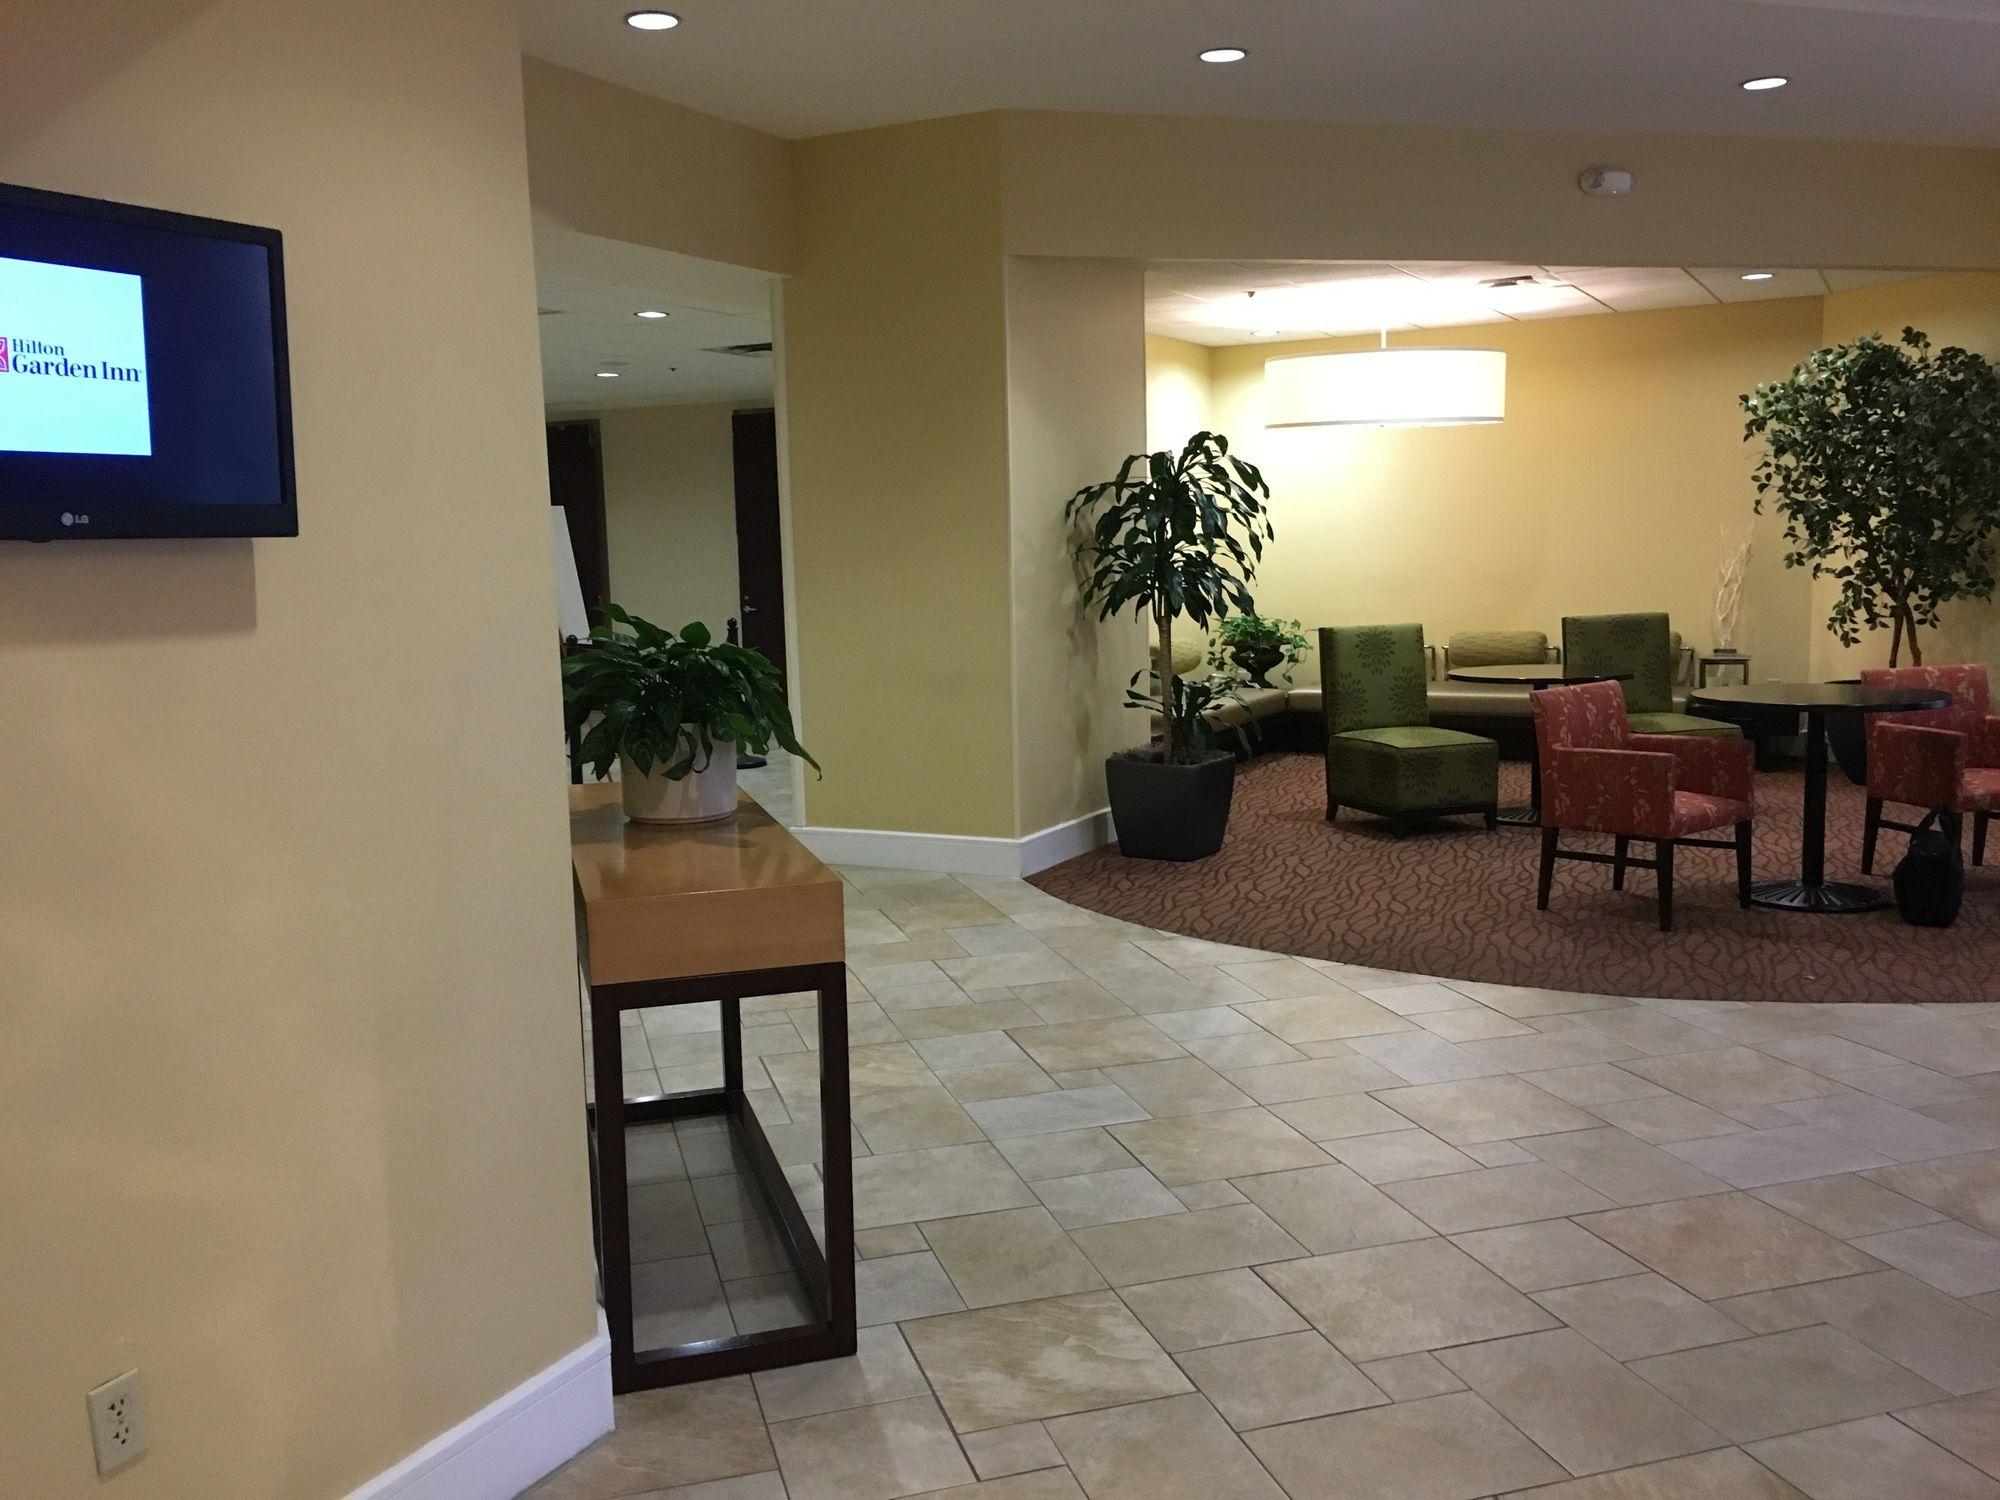 Phoenix hotel coupons for phoenix arizona for Hilton garden inn phoenix midtown phoenix az